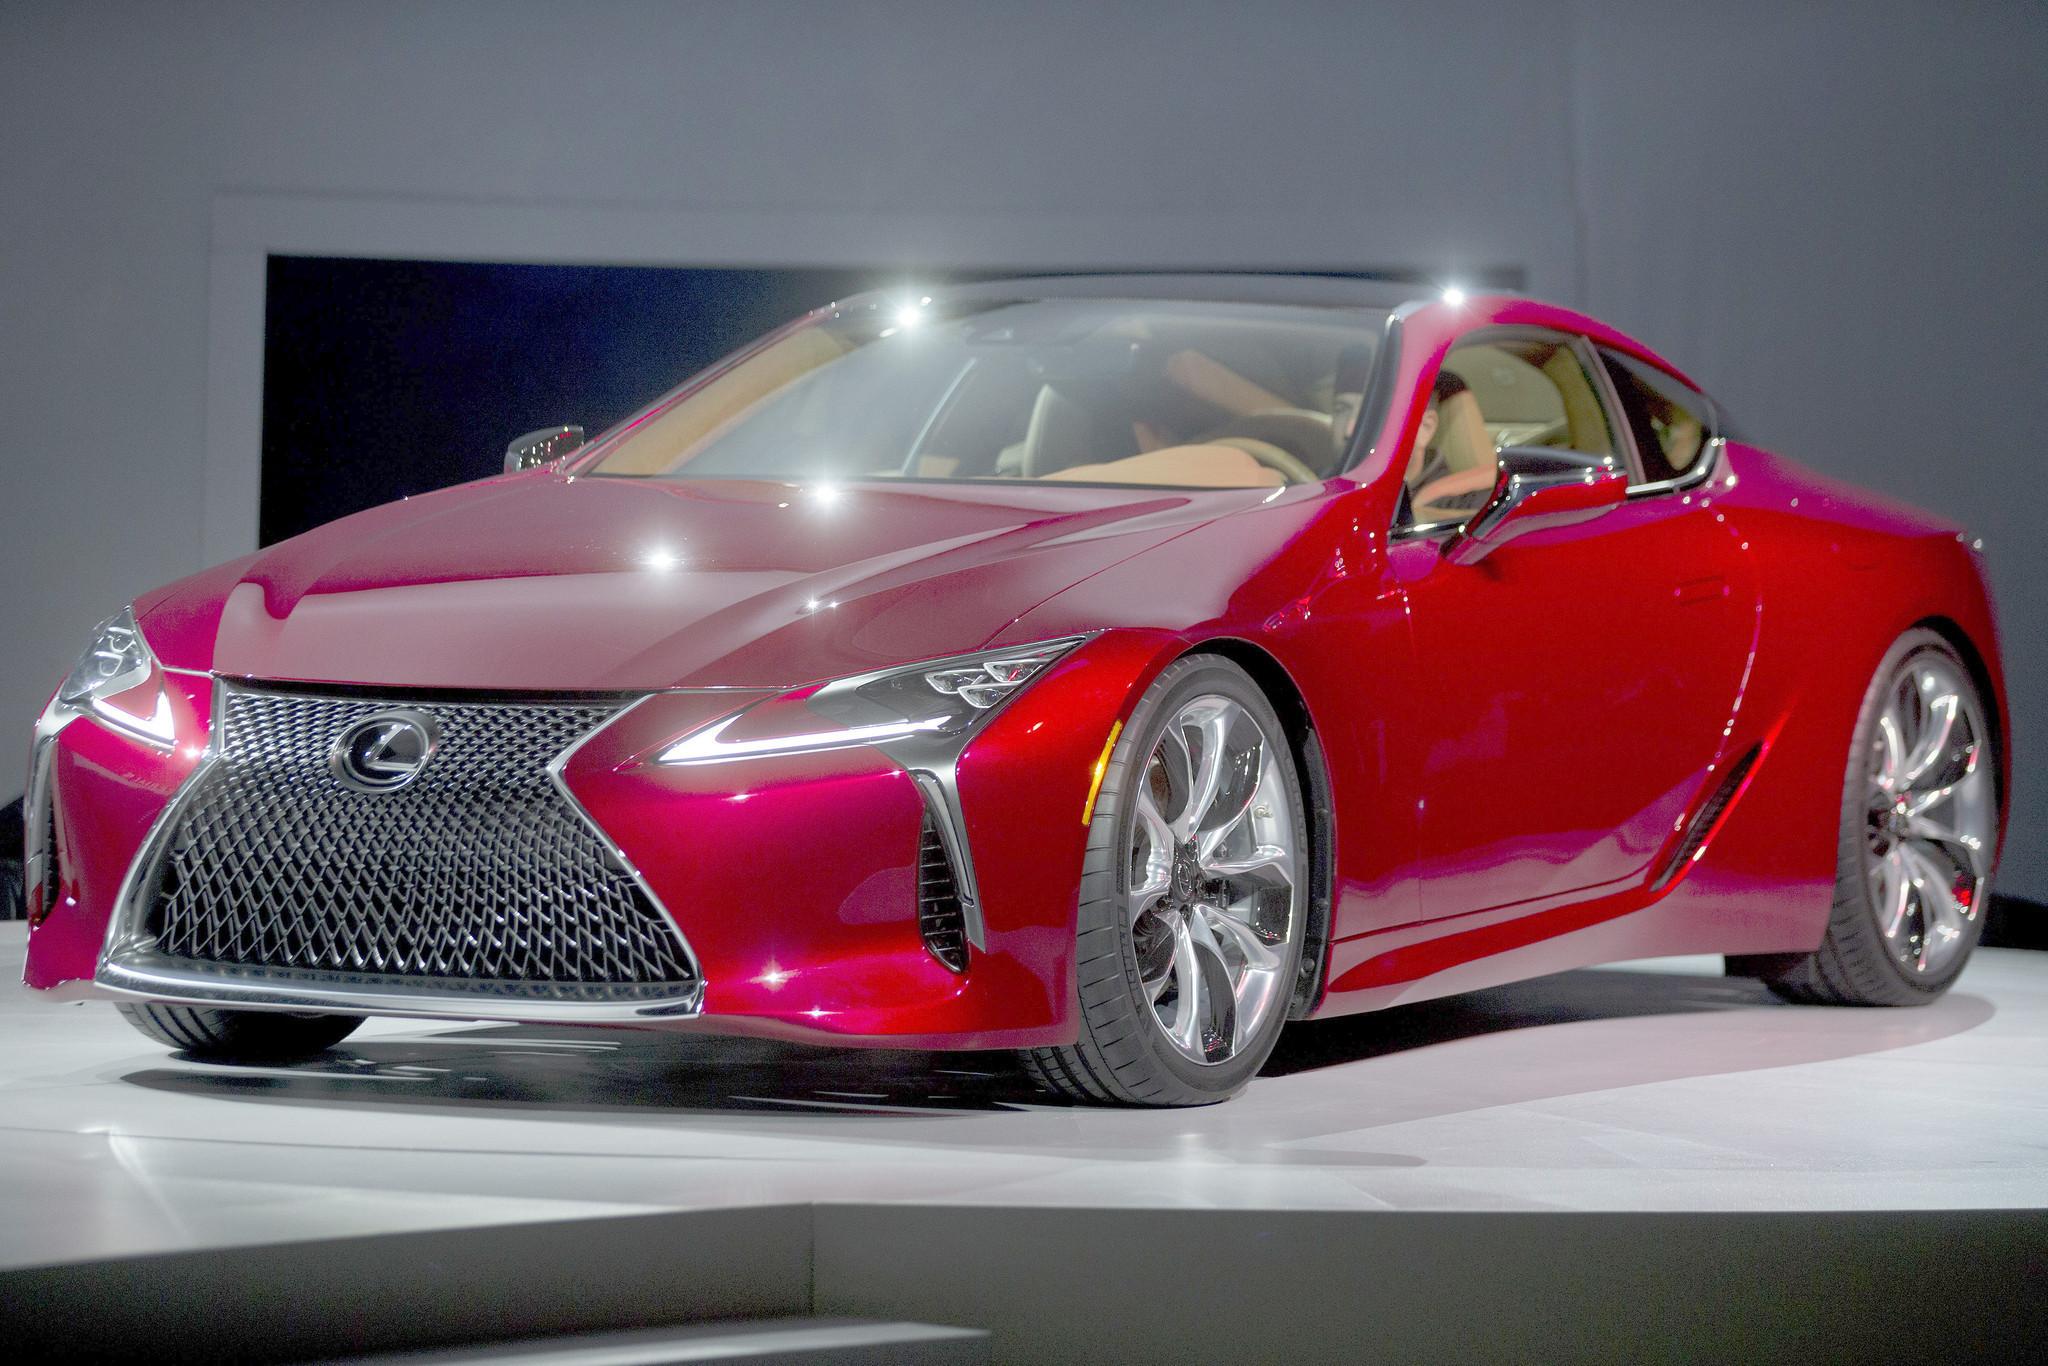 Dynamic Auto Sales >> Lexus unveils high-powered LC 500 sports coupe - Chicago Tribune